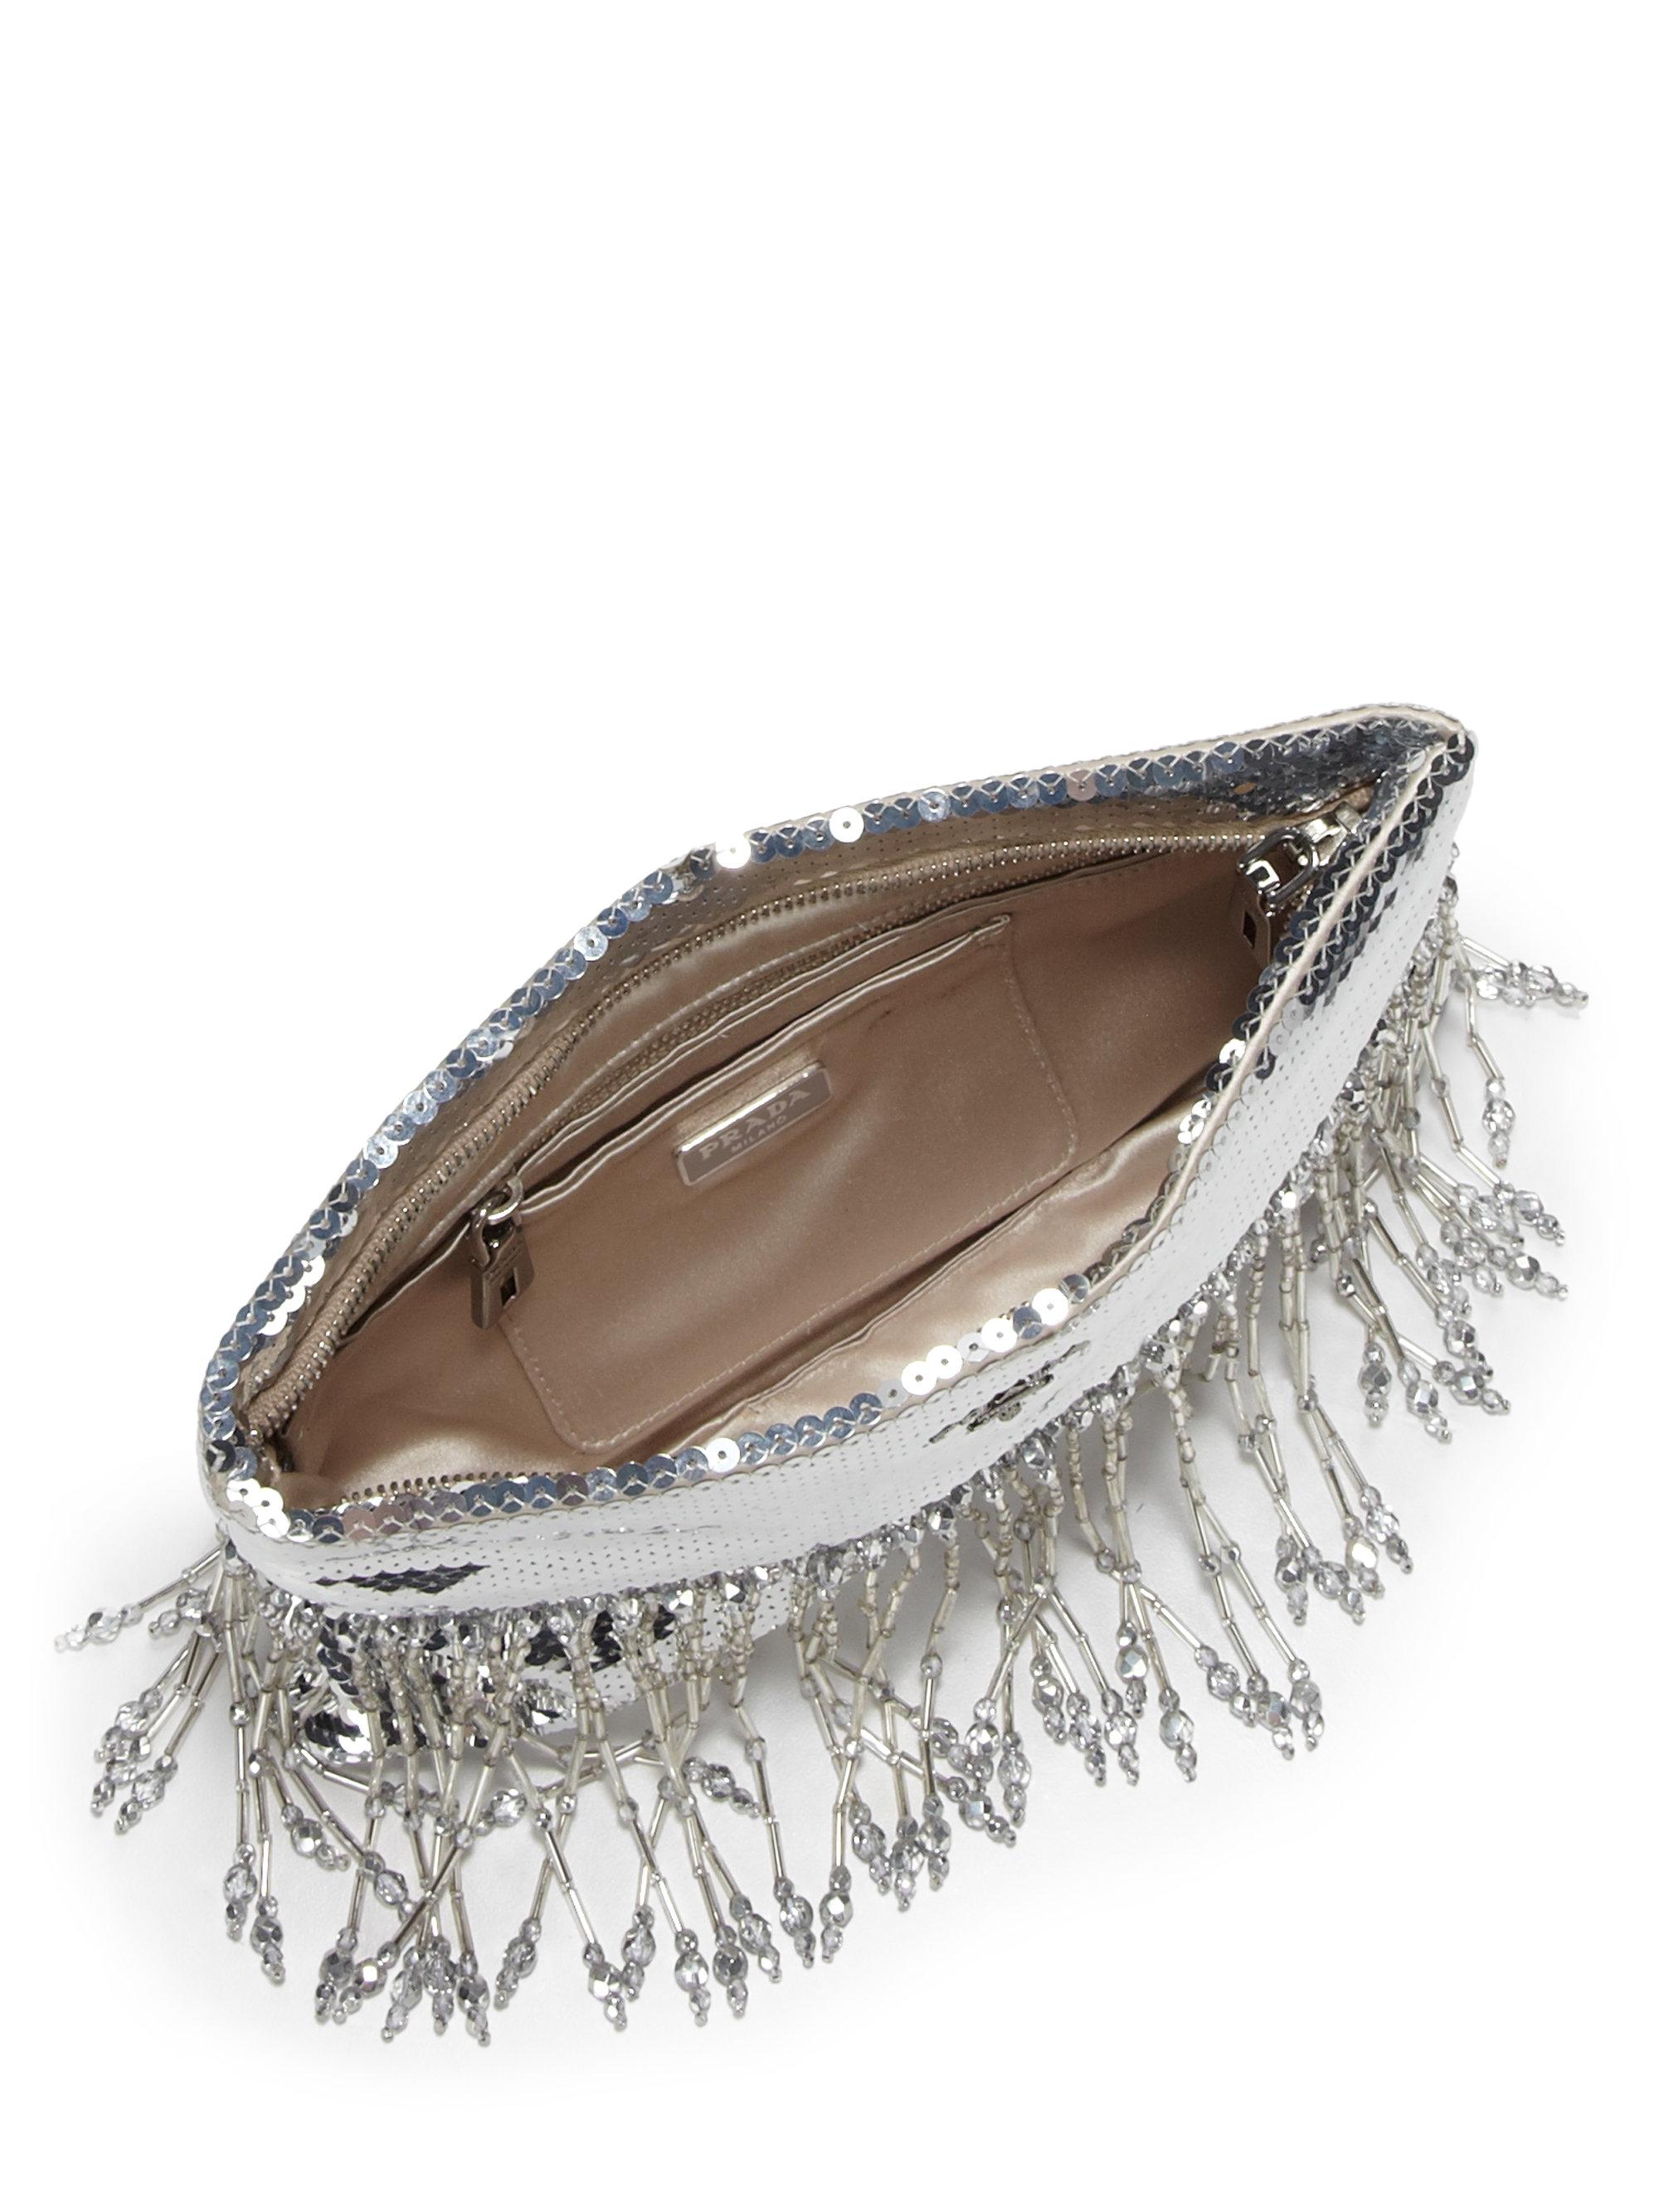 prada wallet for women - Prada Paillettes Fringe Clutch in Silver (ARGENTO-SILVER)   Lyst